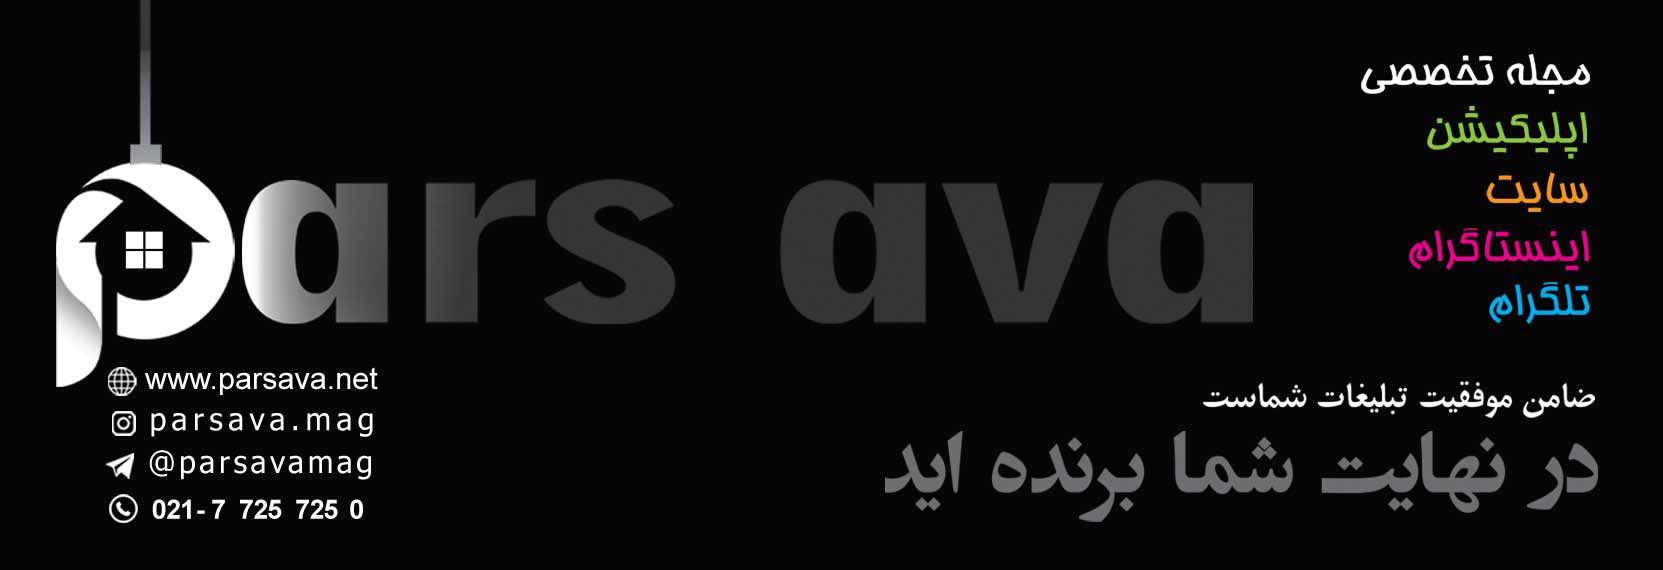 مجله پارس آوا